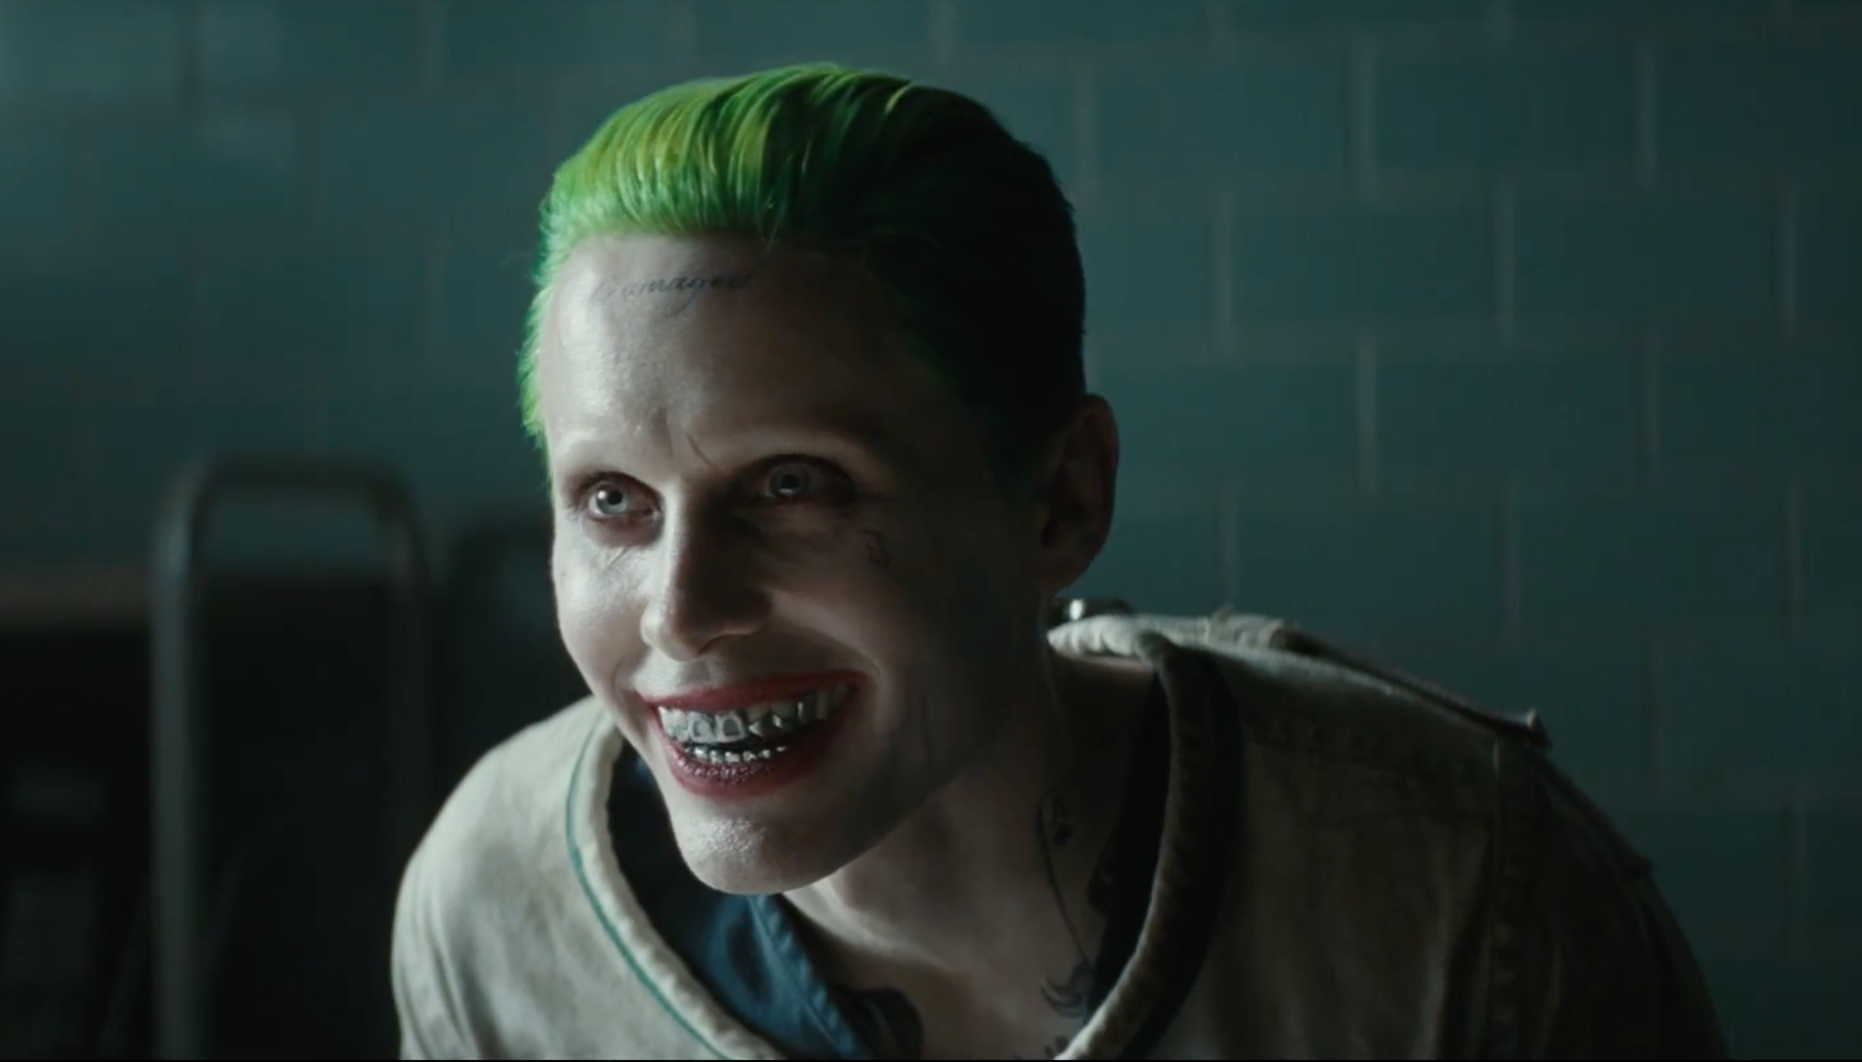 WATCH: New Joker Focused 'Suicide Squad' Promo